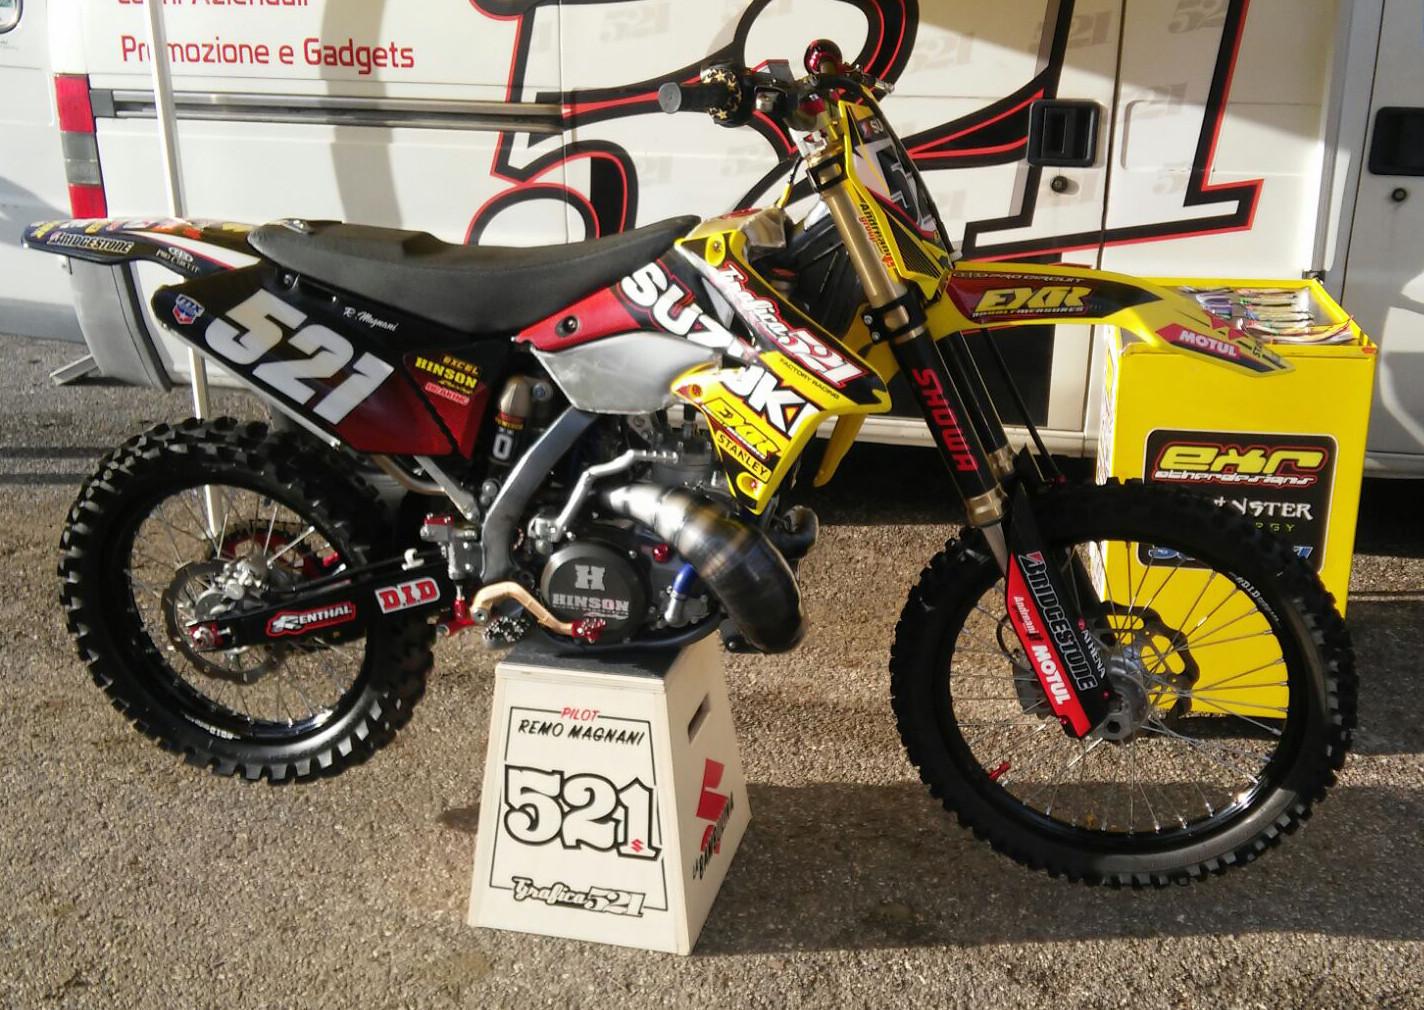 10df15c29-c8fe-45bc-943c-4693a16ef9cb - effettoxtremo - Motocross Pictures - Vital MX